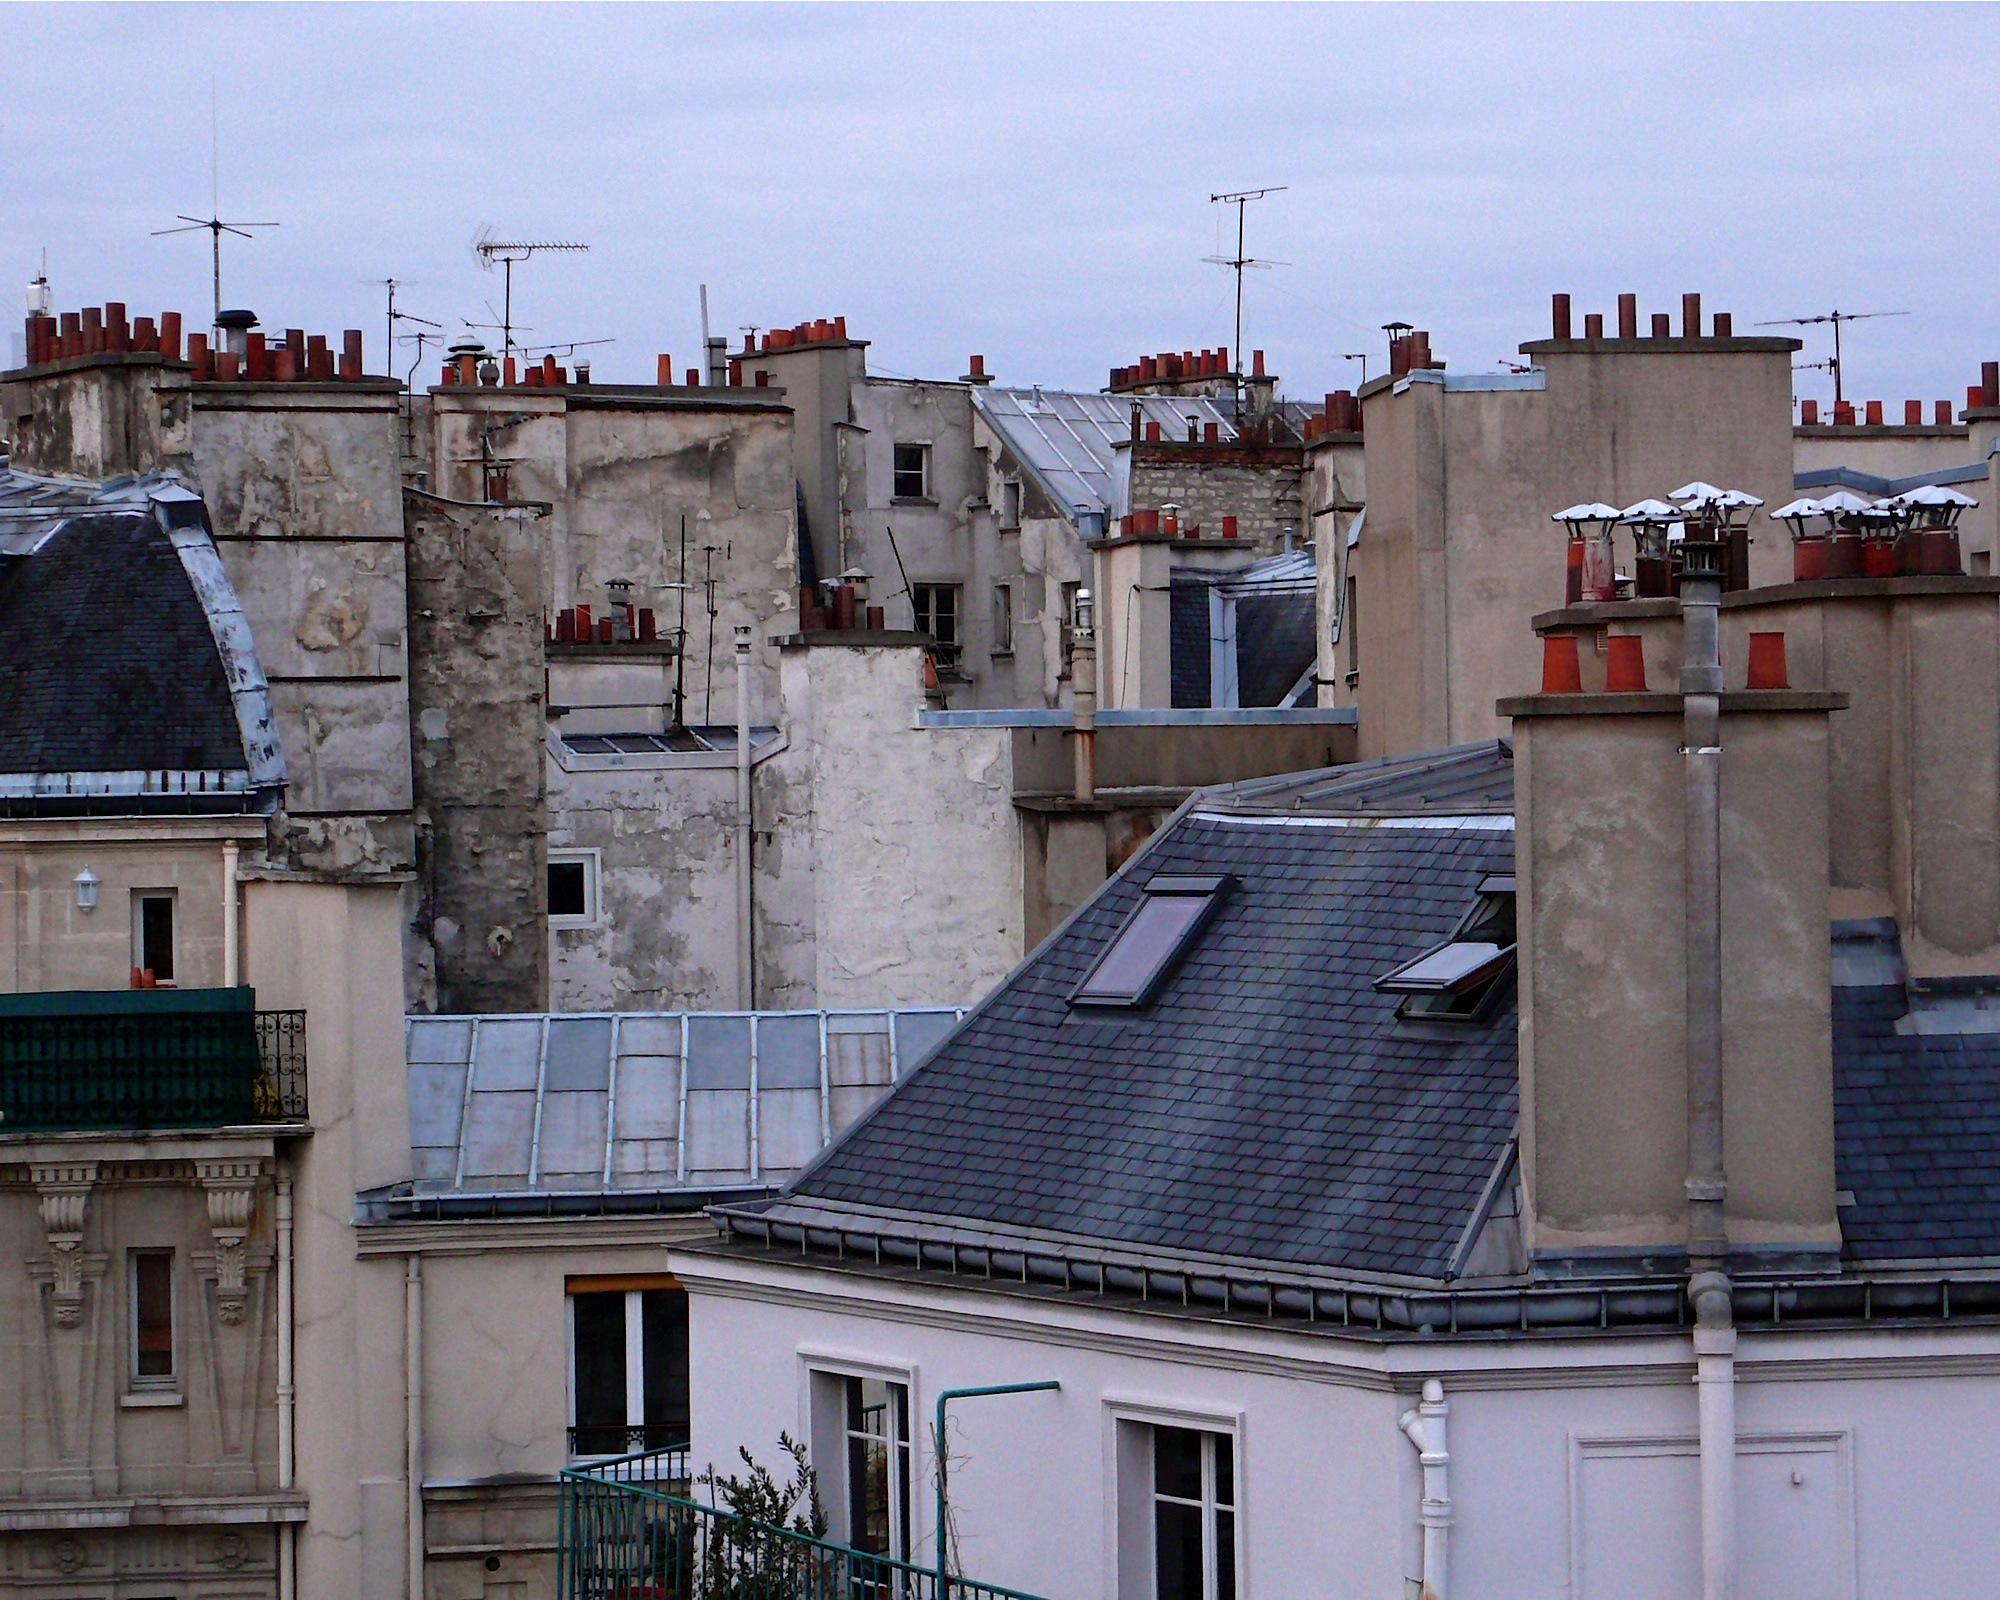 paris-rooftops-16x20-P1110552.jpg